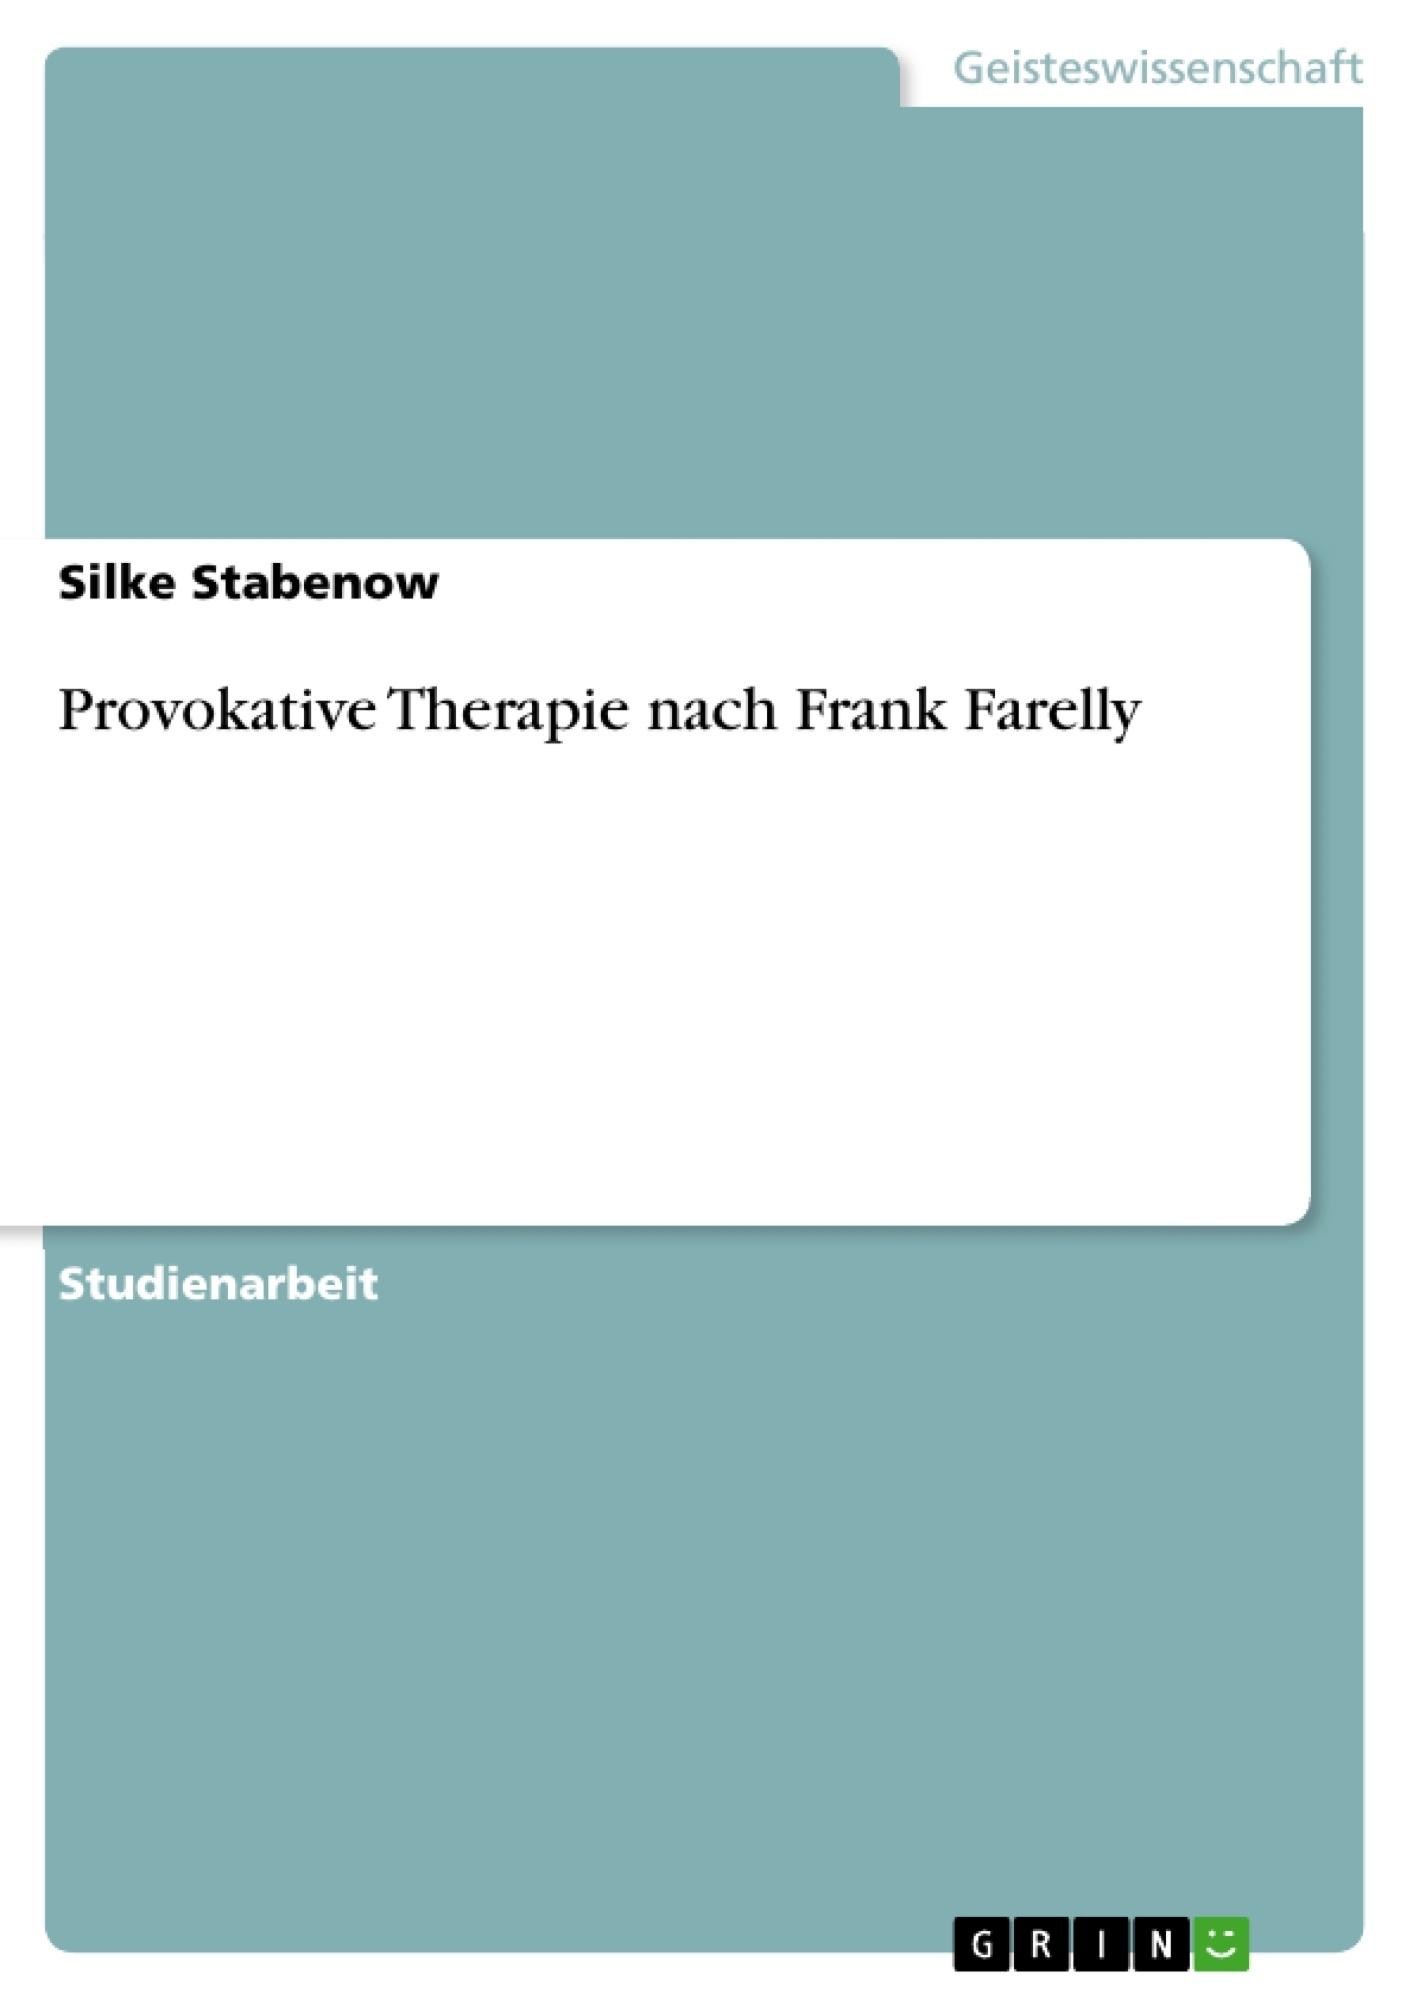 Titel: Provokative Therapie nach Frank Farelly